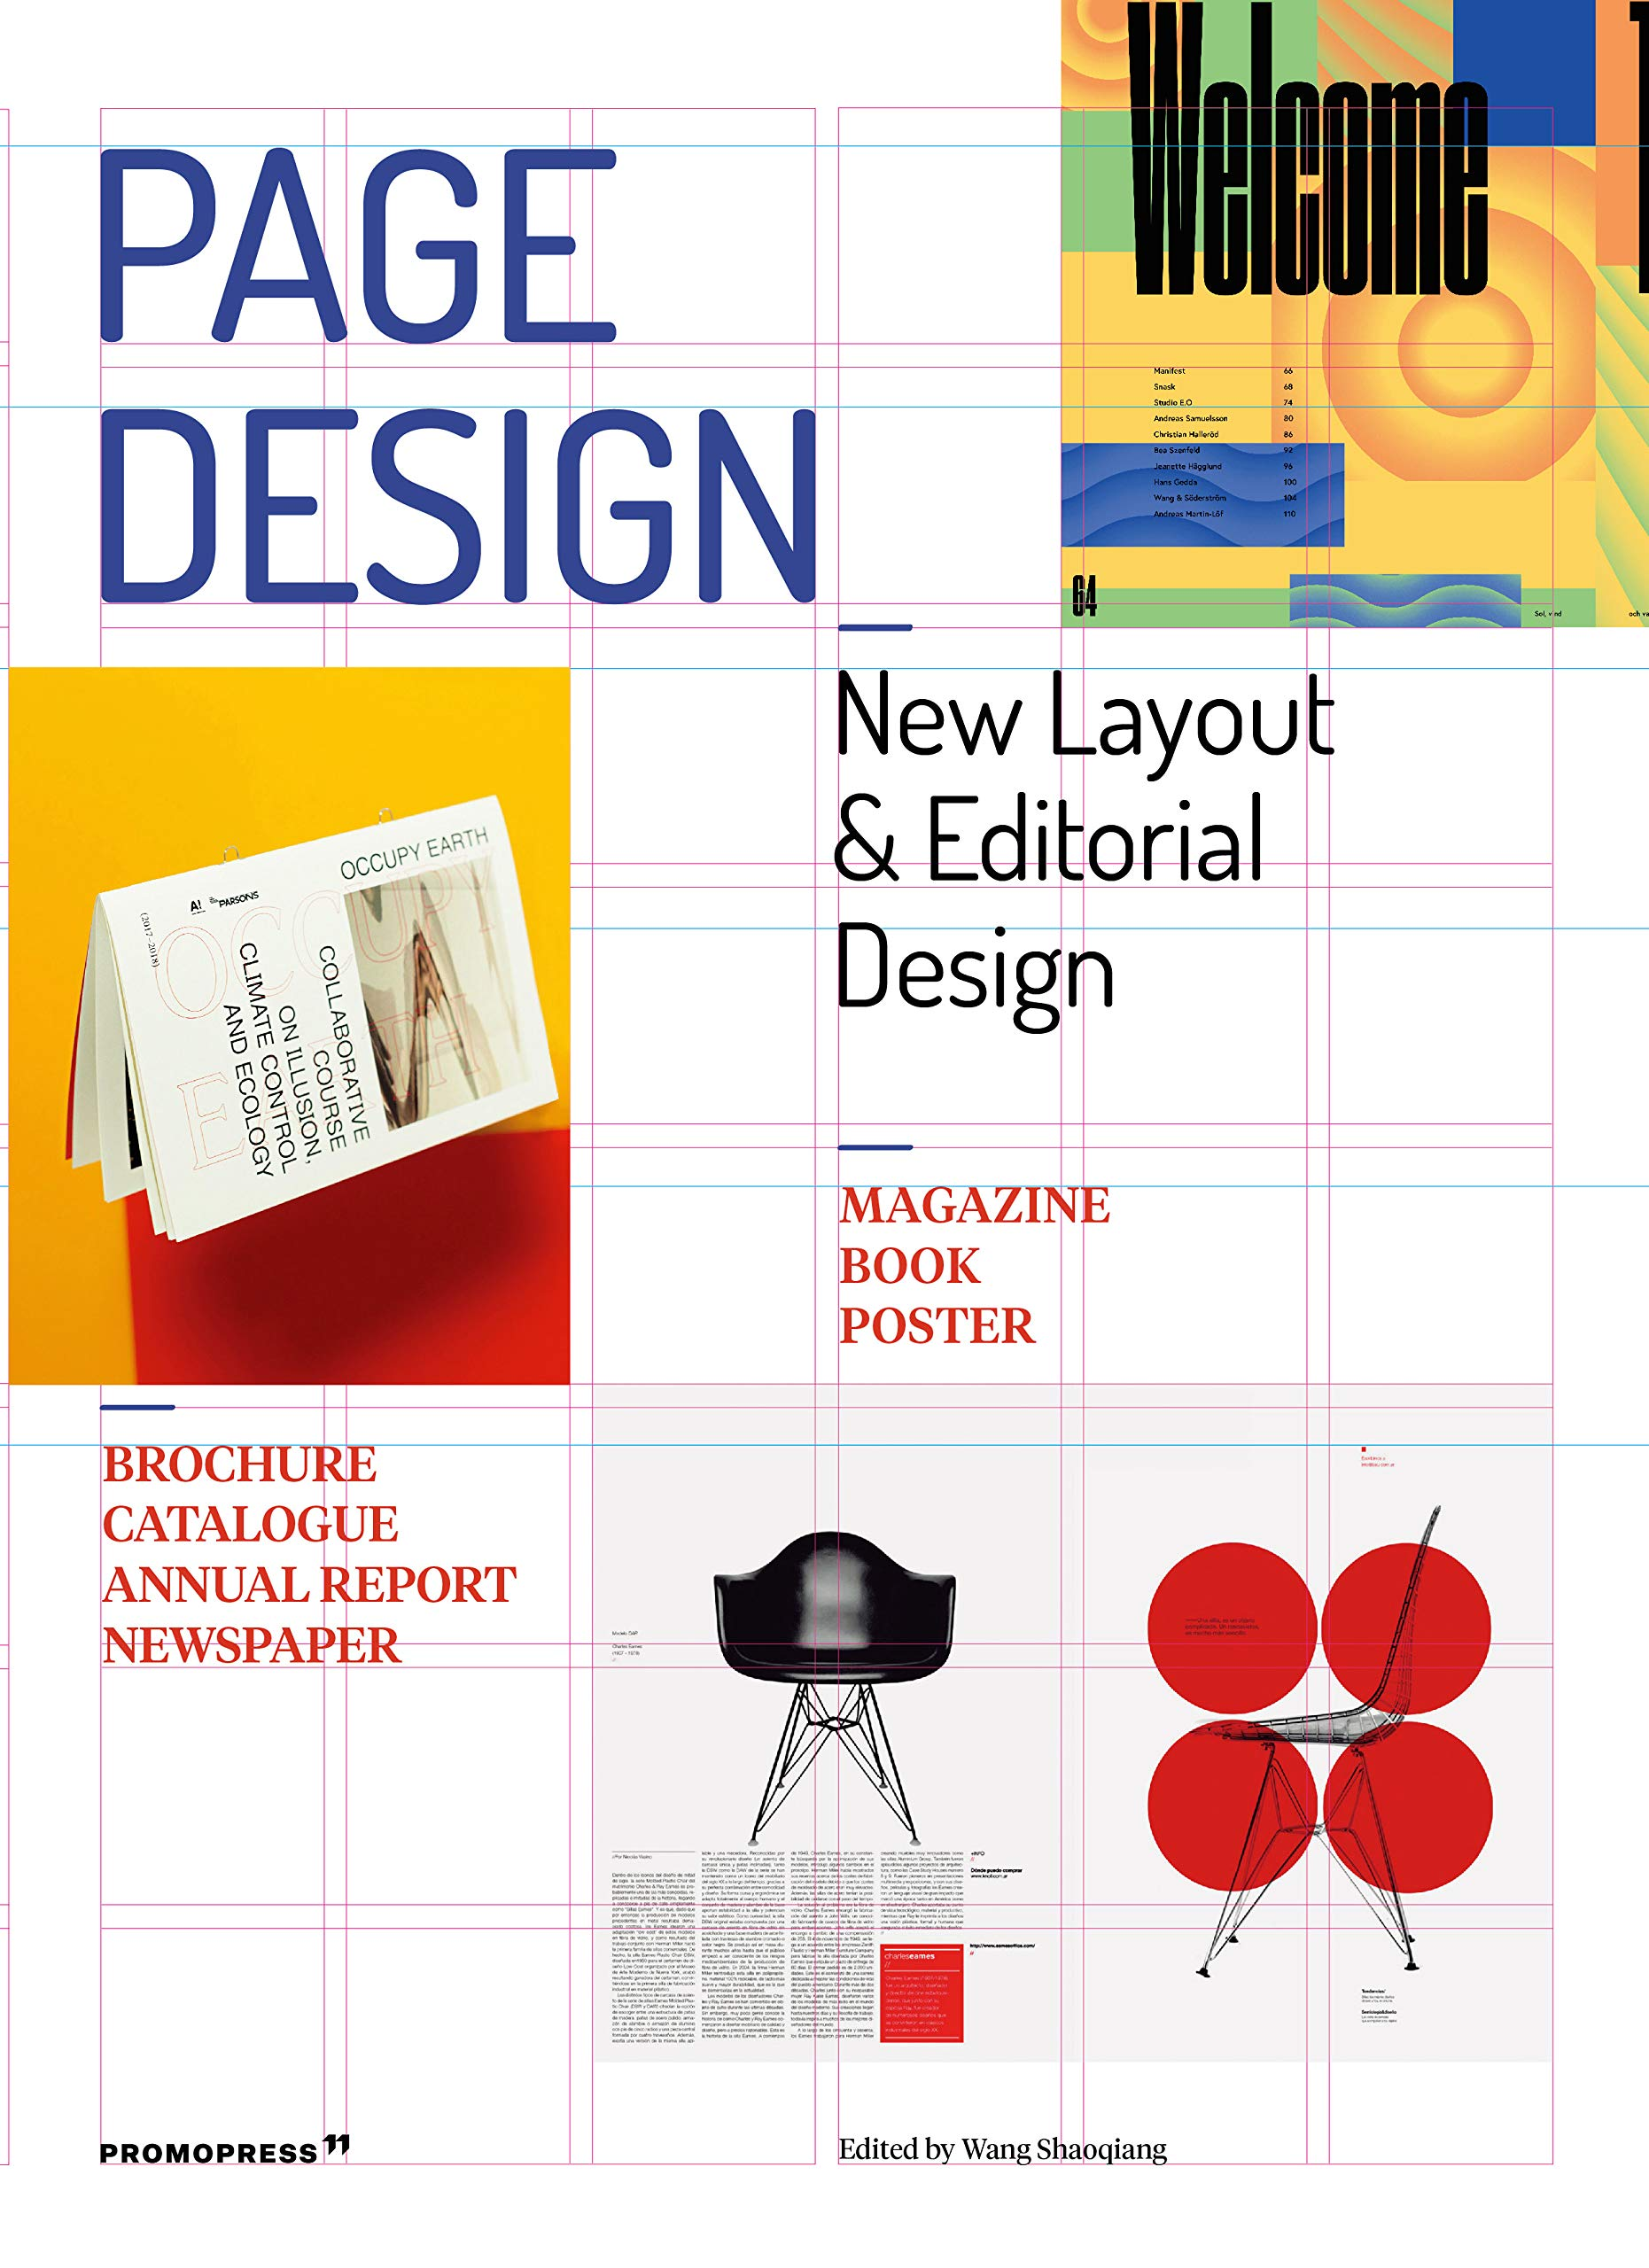 9a969bd177384e Page Design  New Layout and Editorial Design (Englisch) Gebundenes Buch –  25. Februar 2019